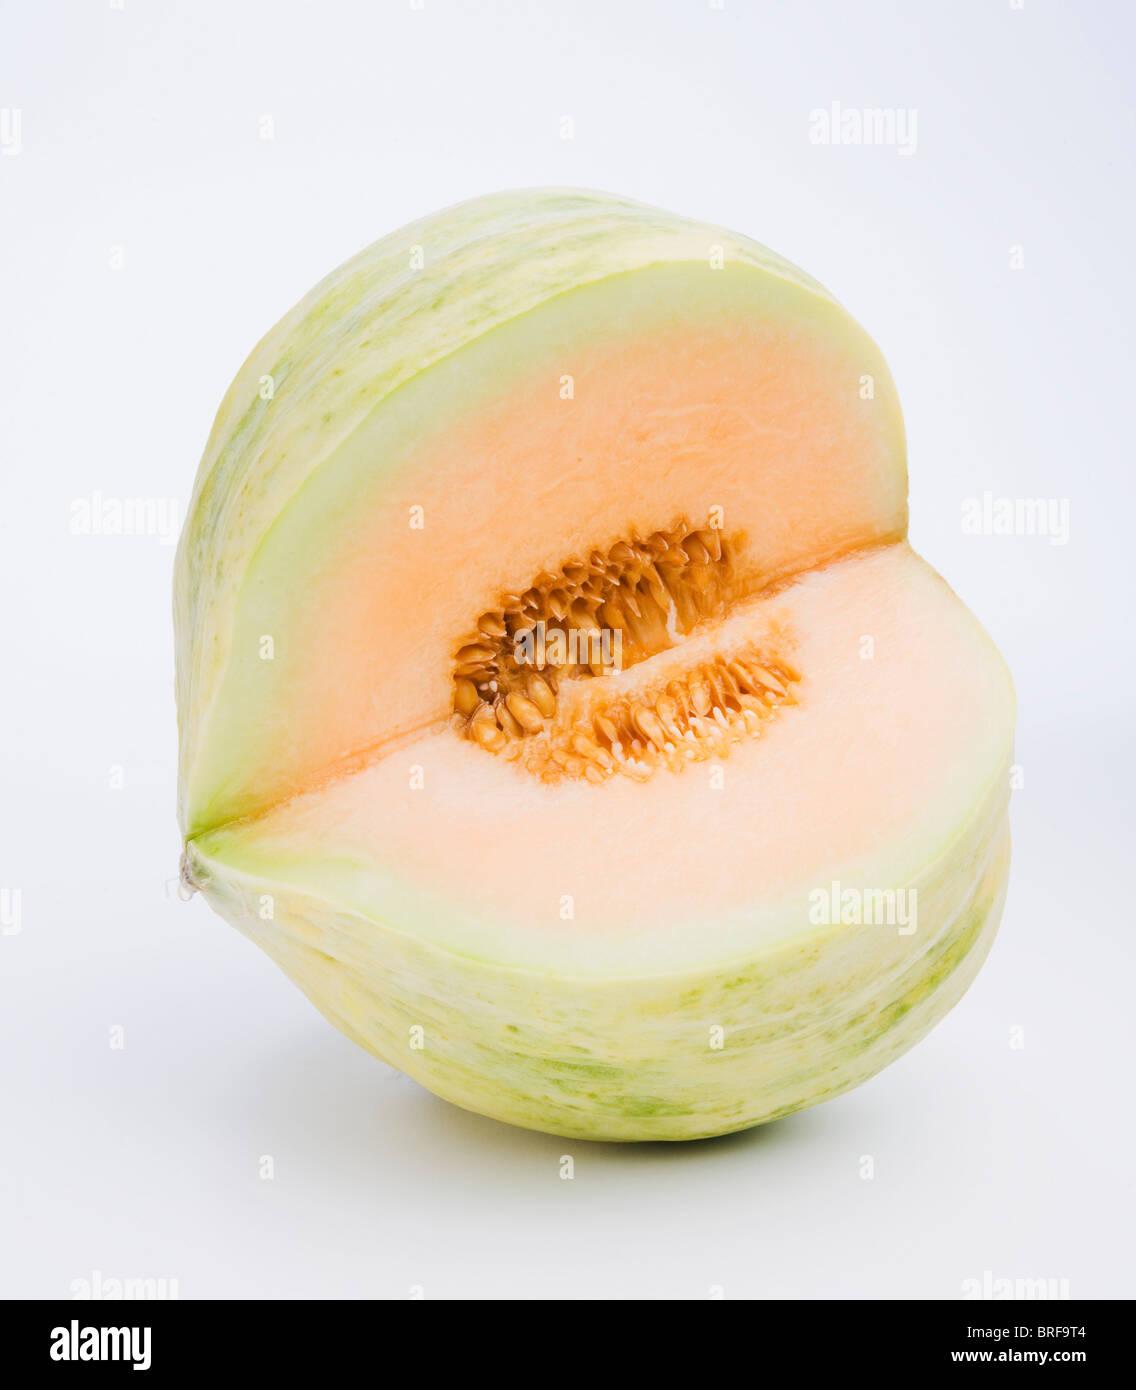 Crenshaw melon, close-up - Stock Image